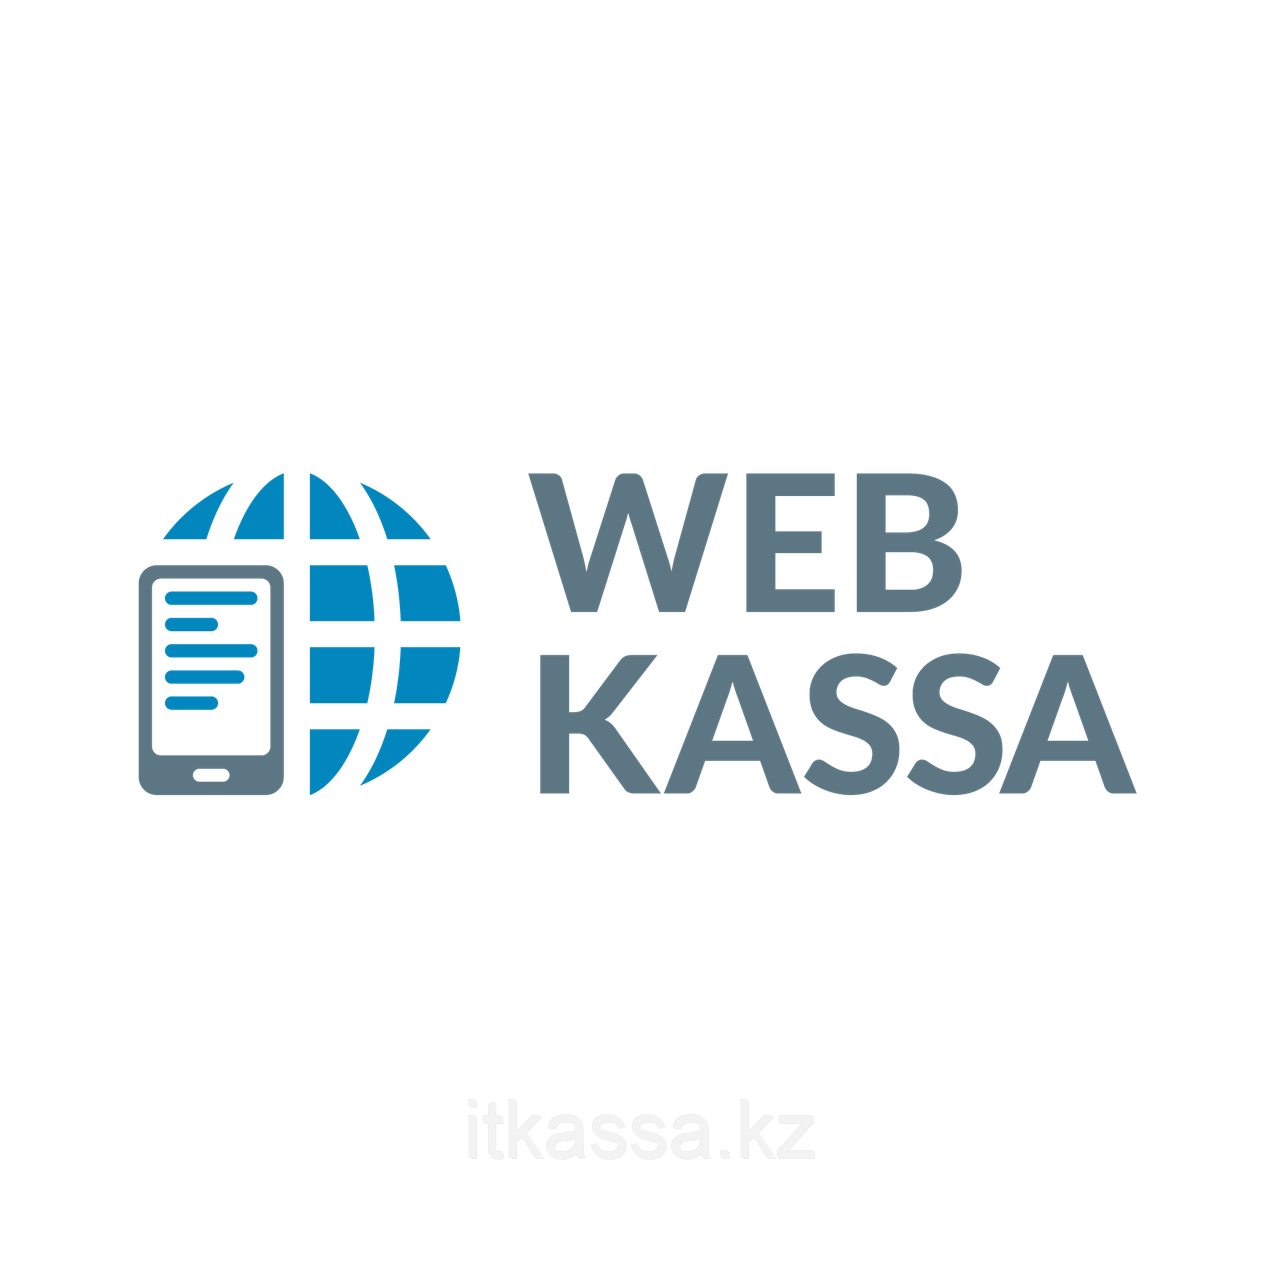 Онлайн кассовый аппарат Webkassa (Вебкасса) — тариф «Популярный»